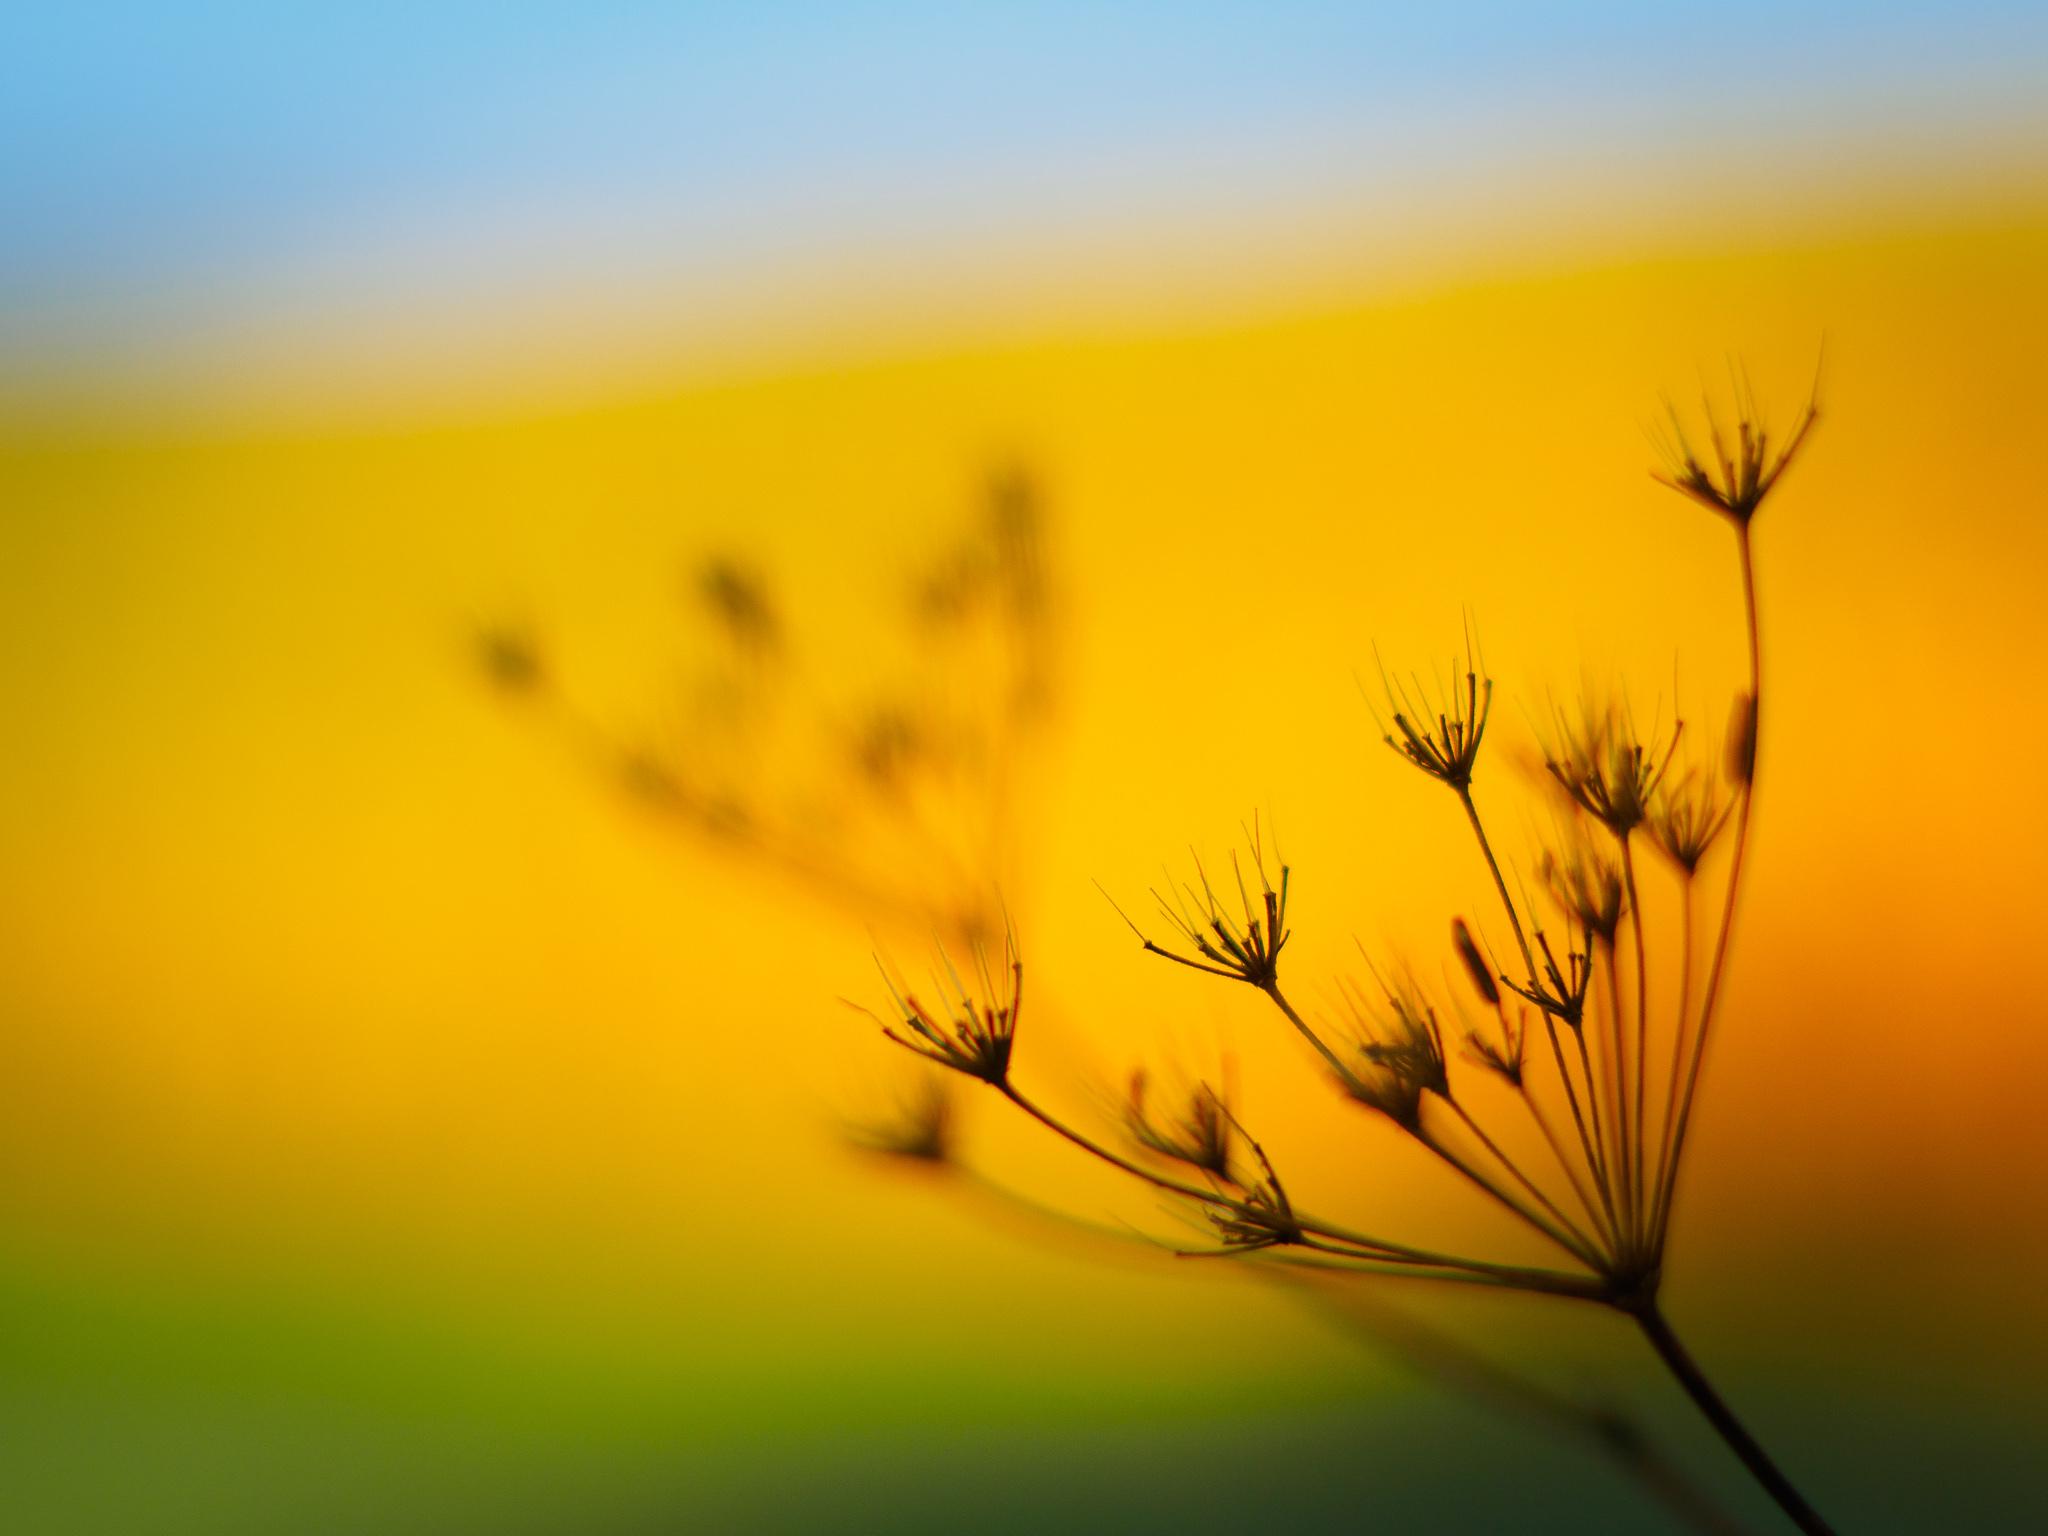 Una flor desenfocada - 2048x1536